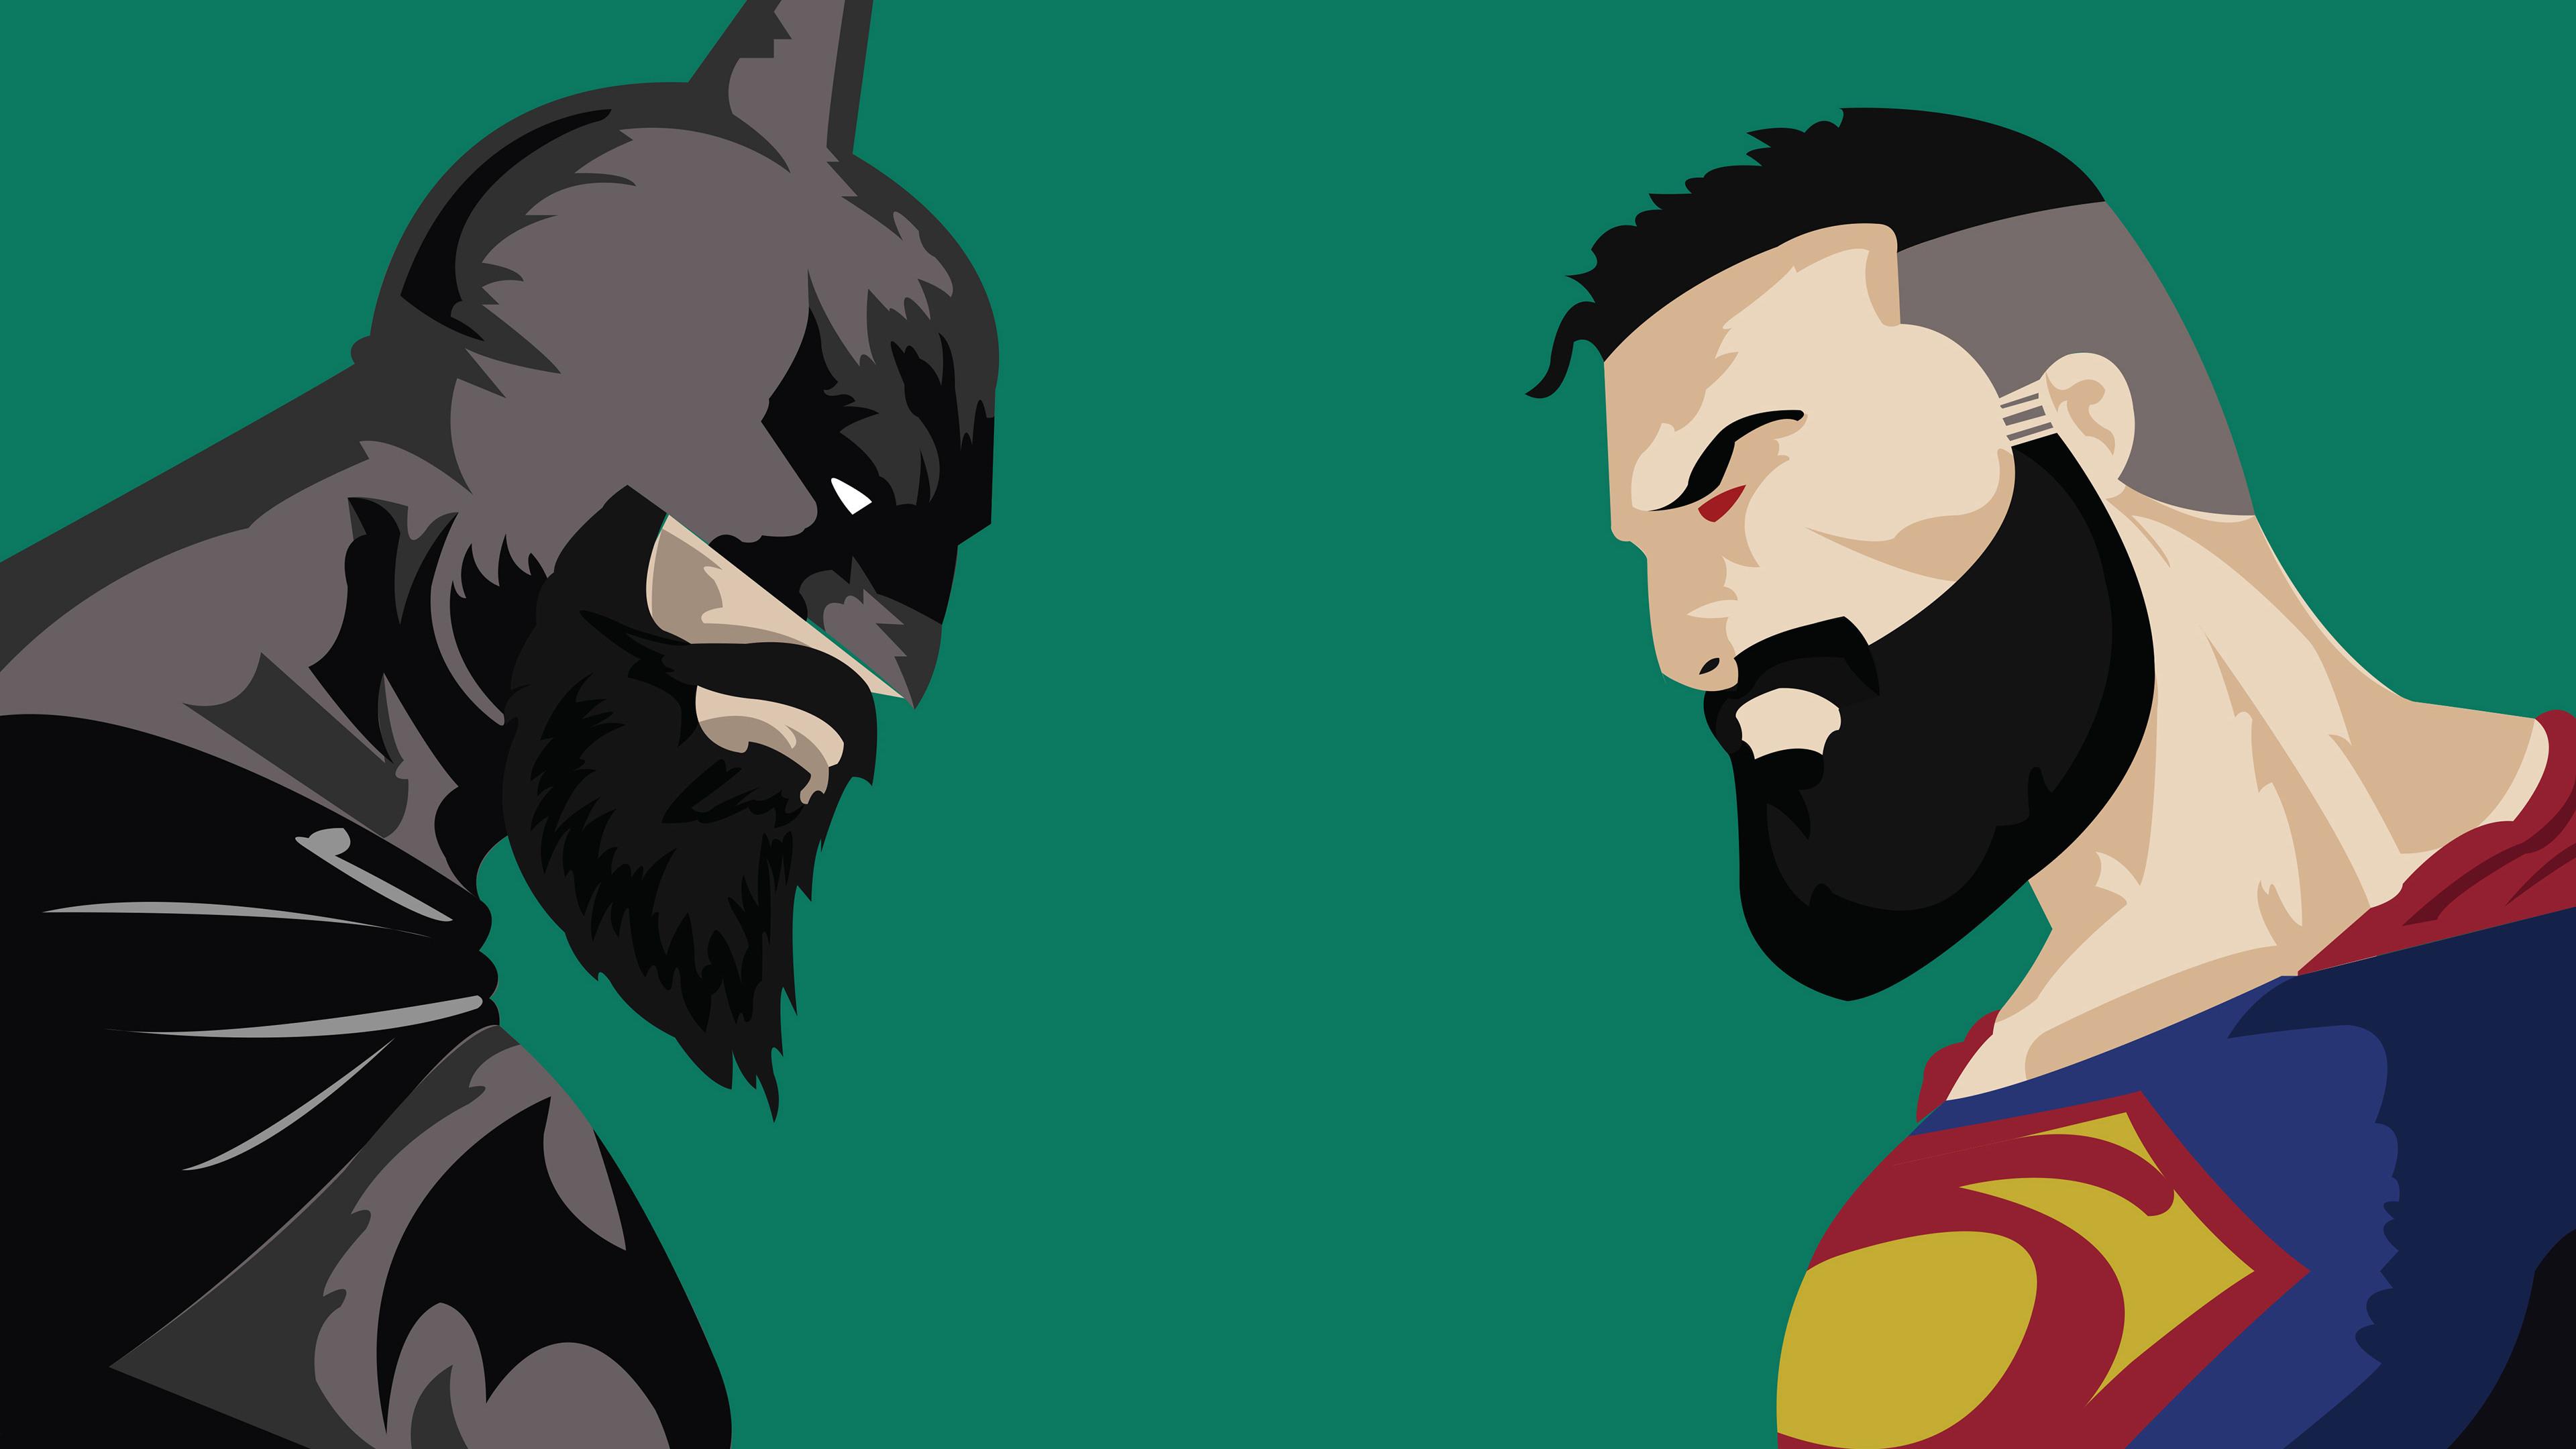 Batman Vs Superman With Beard